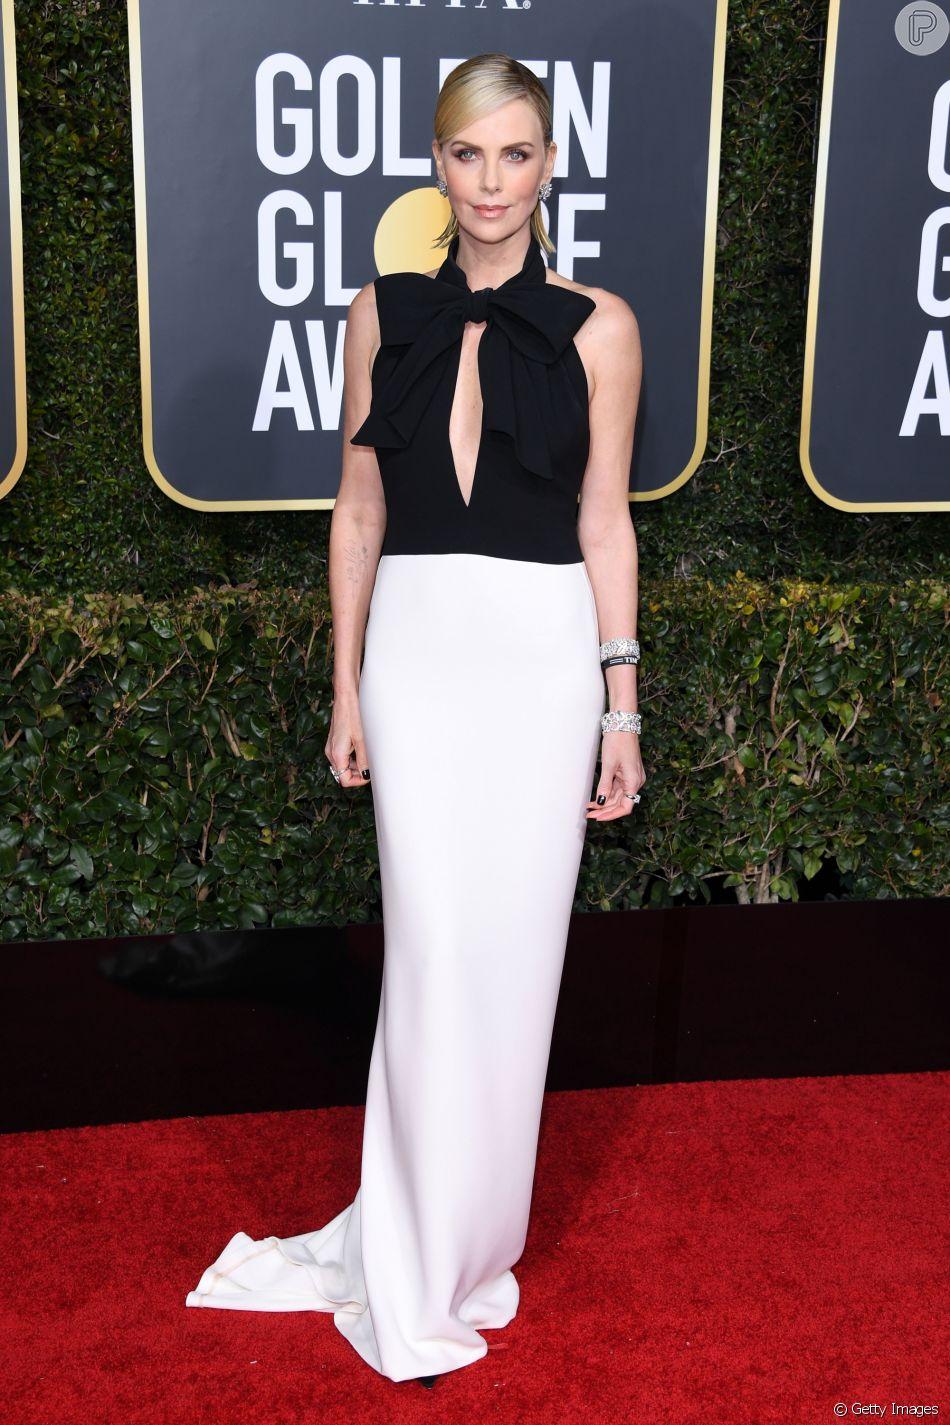 Trend minimalista marca presença no tapete vermelho:  Charlize Theron